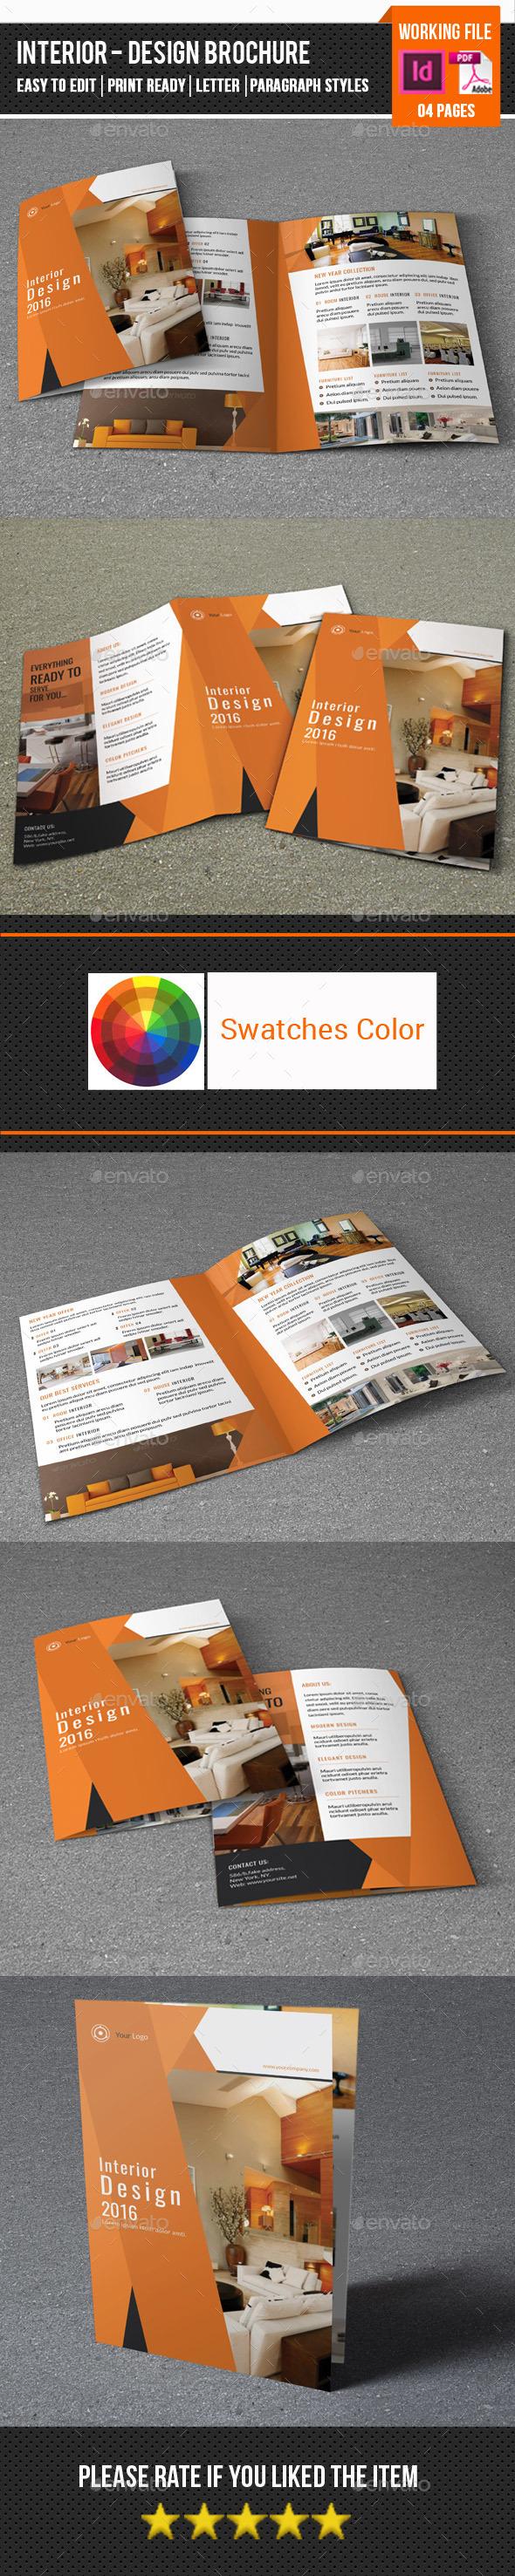 Interior Design Brochure-V343 - Corporate Brochures